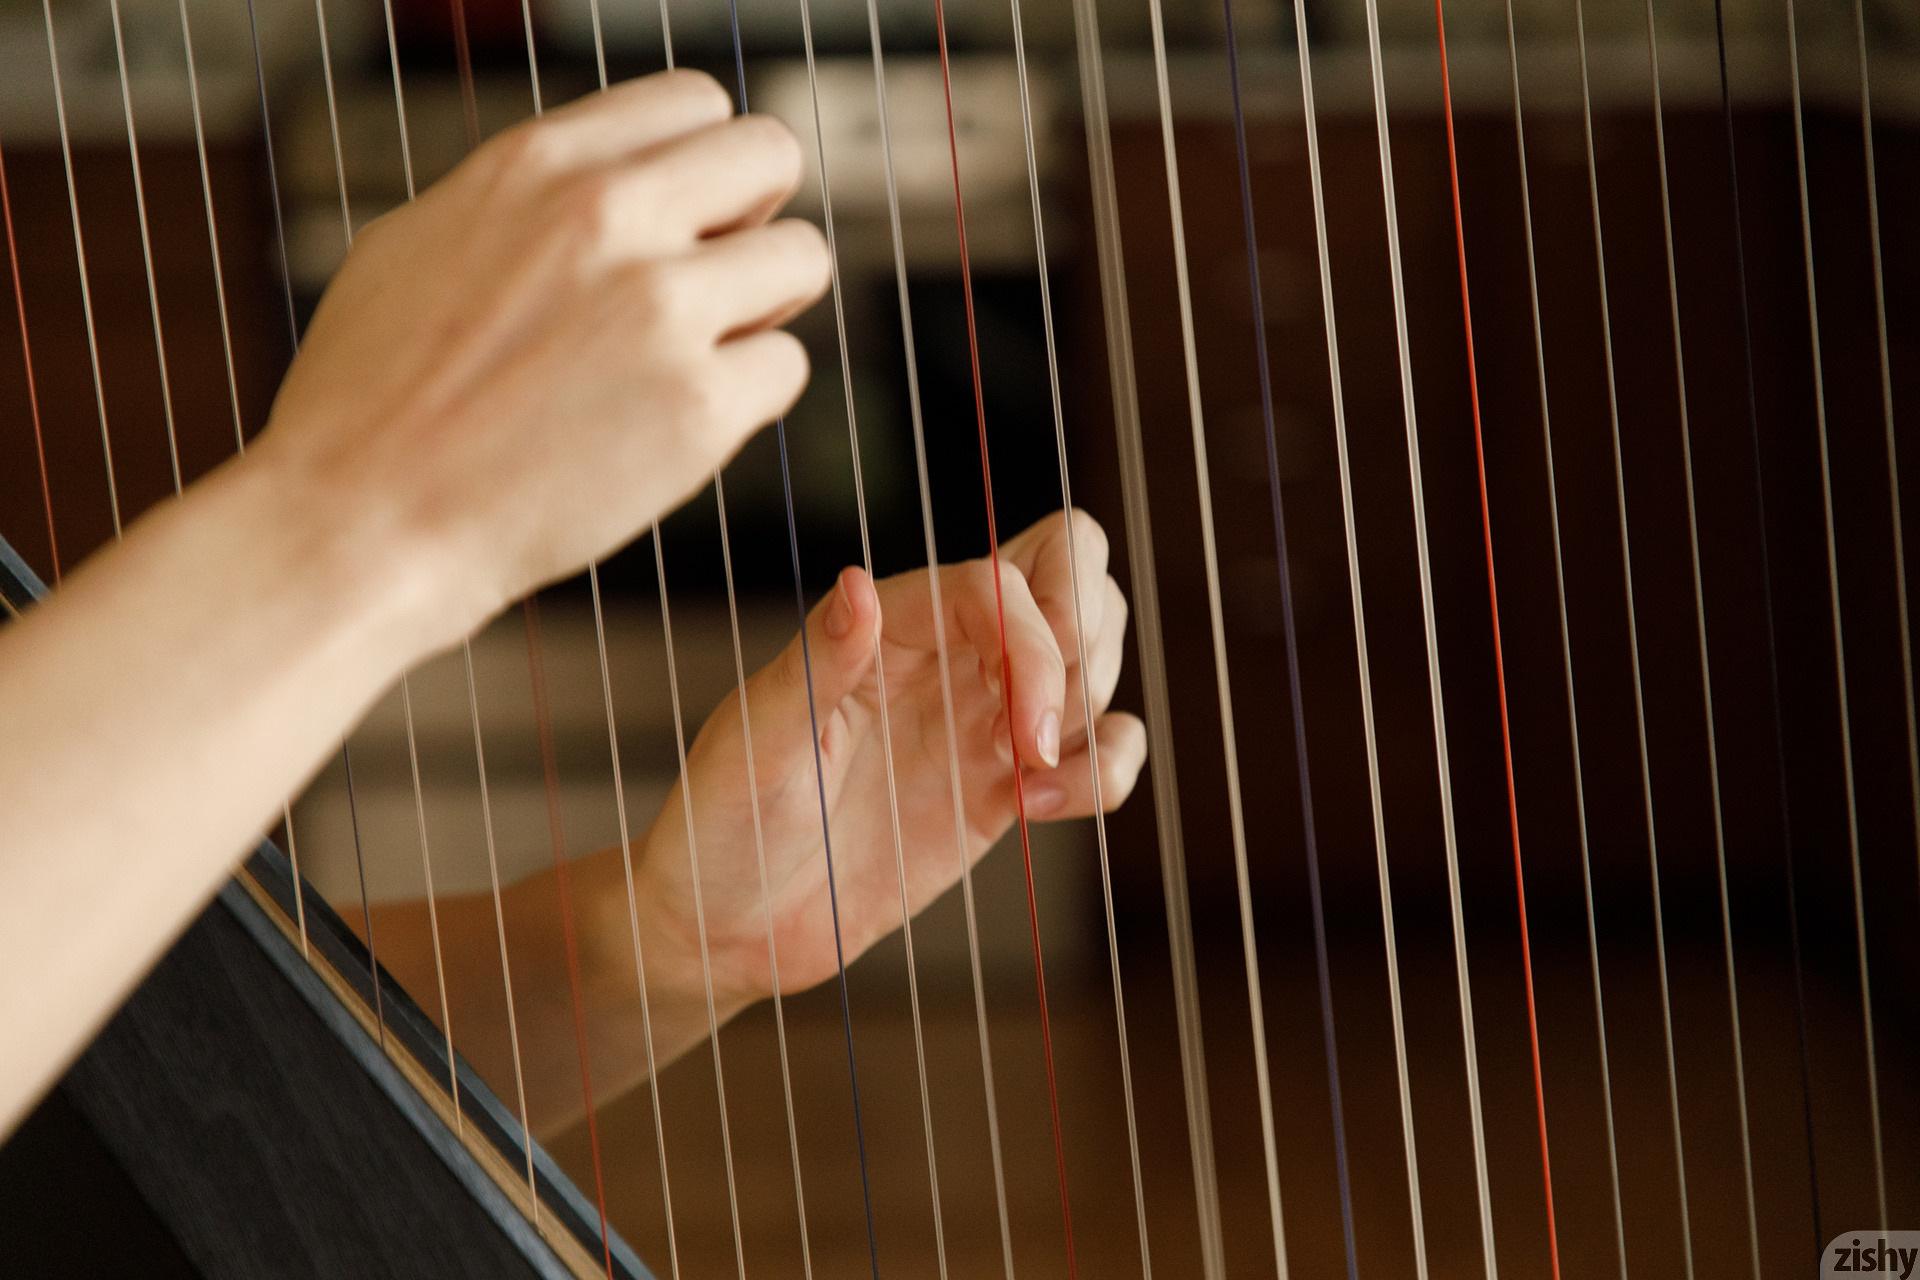 Helen Bergstrom Show Me Your Strings Zishy (24)